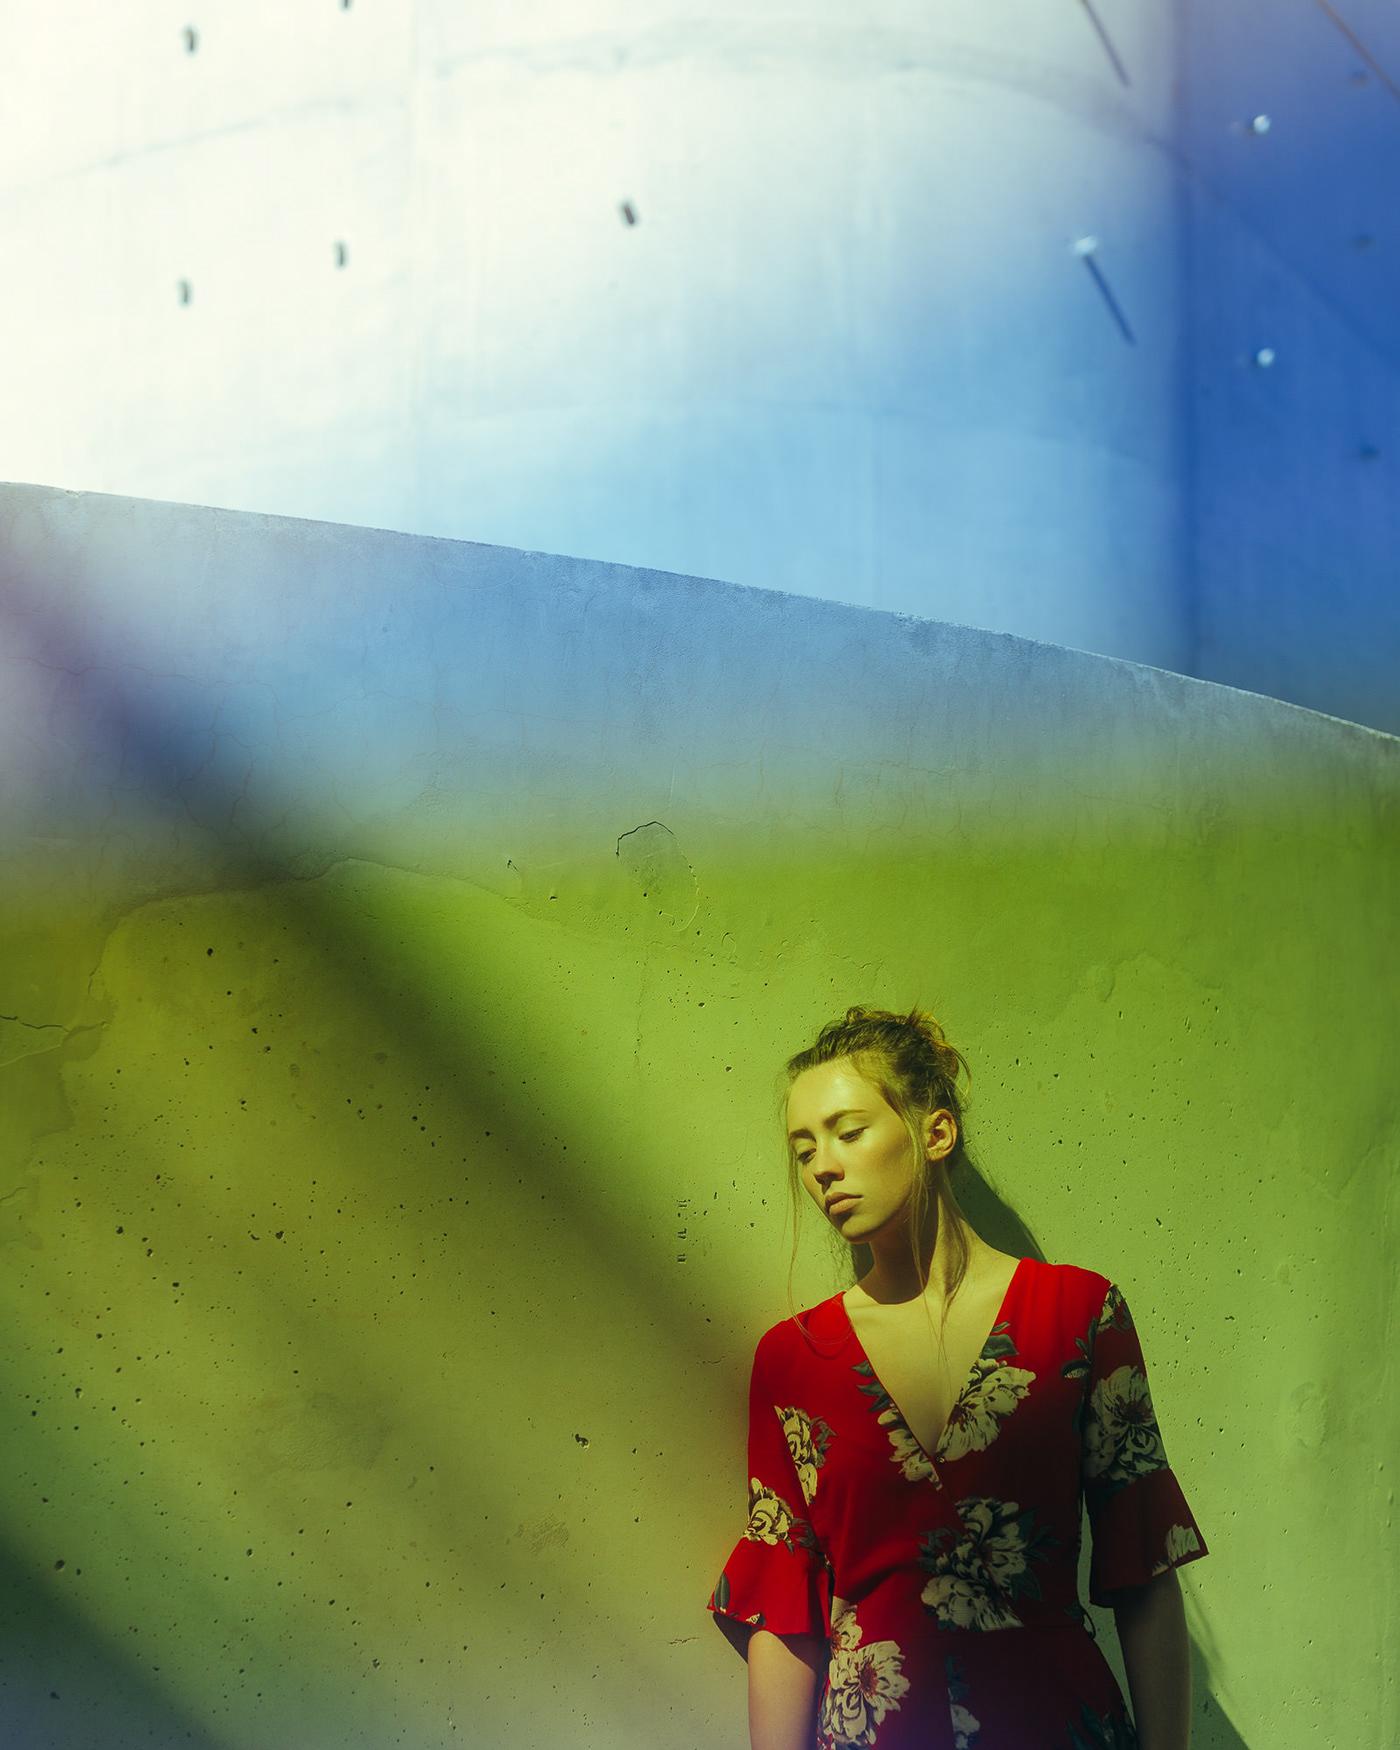 LA JEUNE FILLE AU KIMONO ROUGE / фотограф Pierre Turtaut